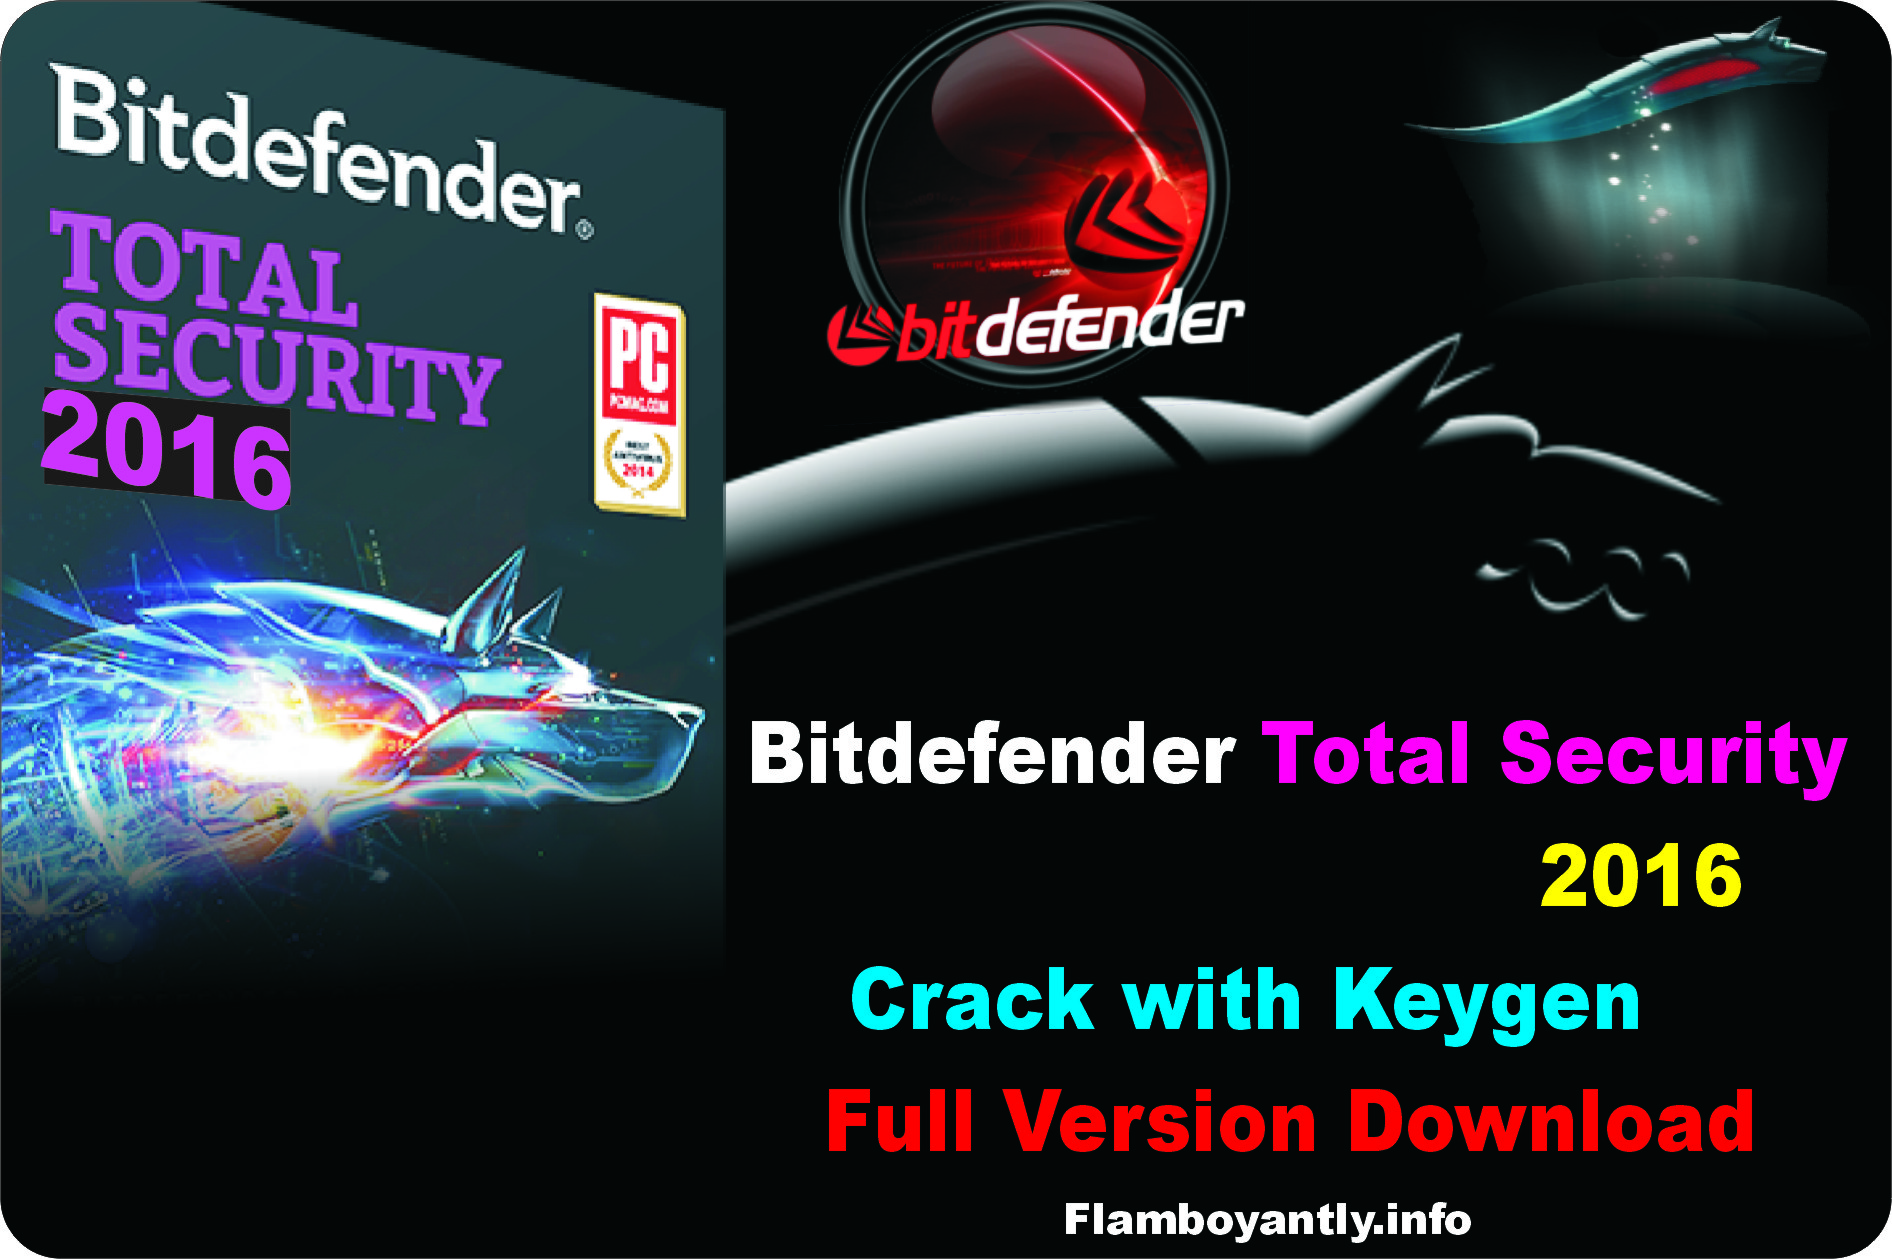 bitdefender total security 2014 download full version